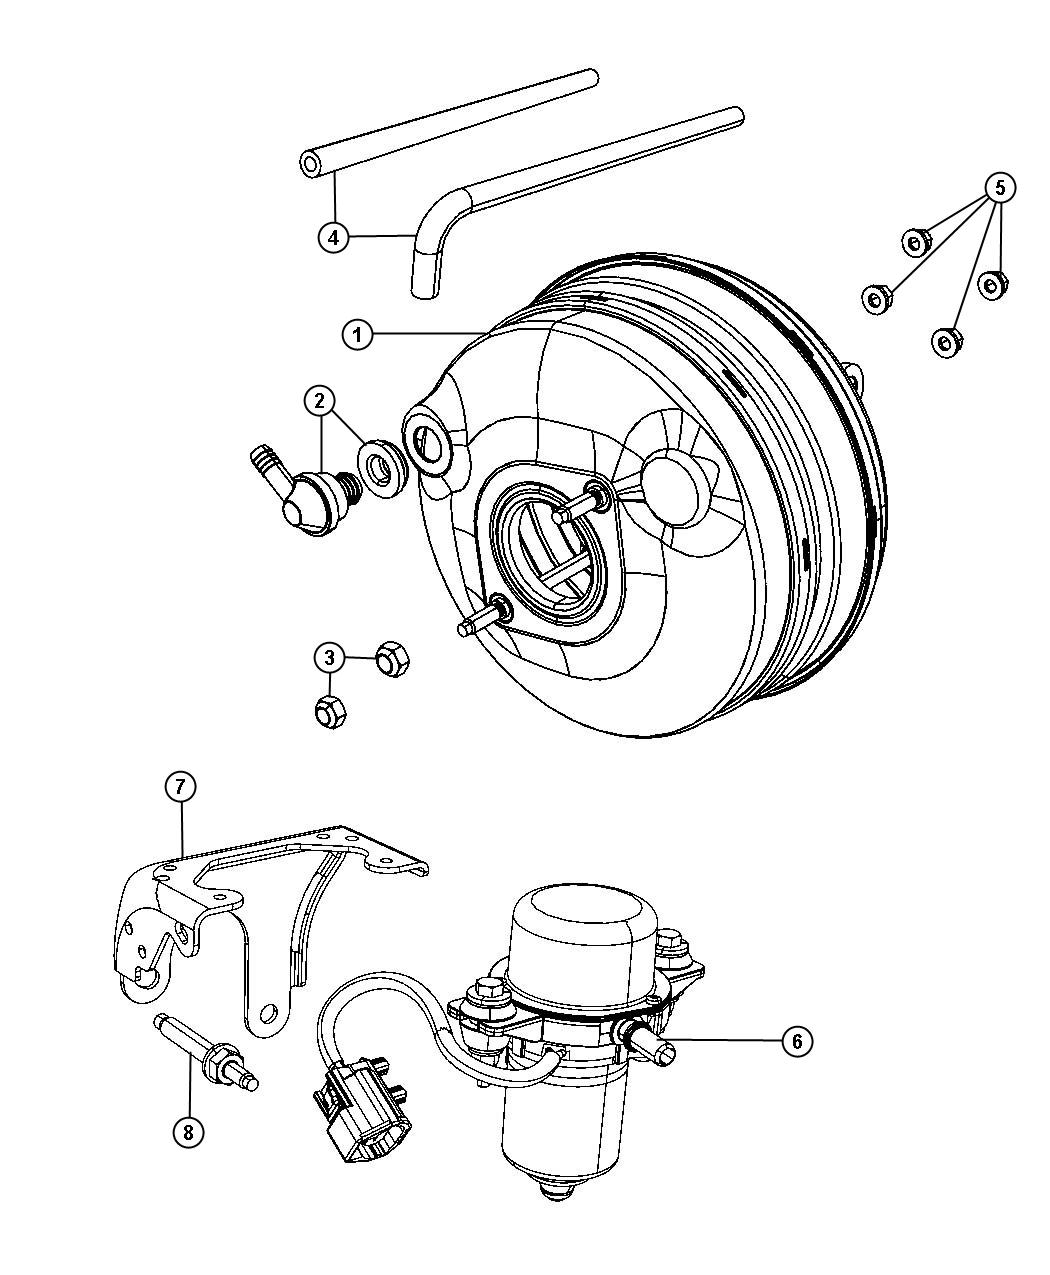 Chrysler Town & Country Valve. Brake booster check. Fxd